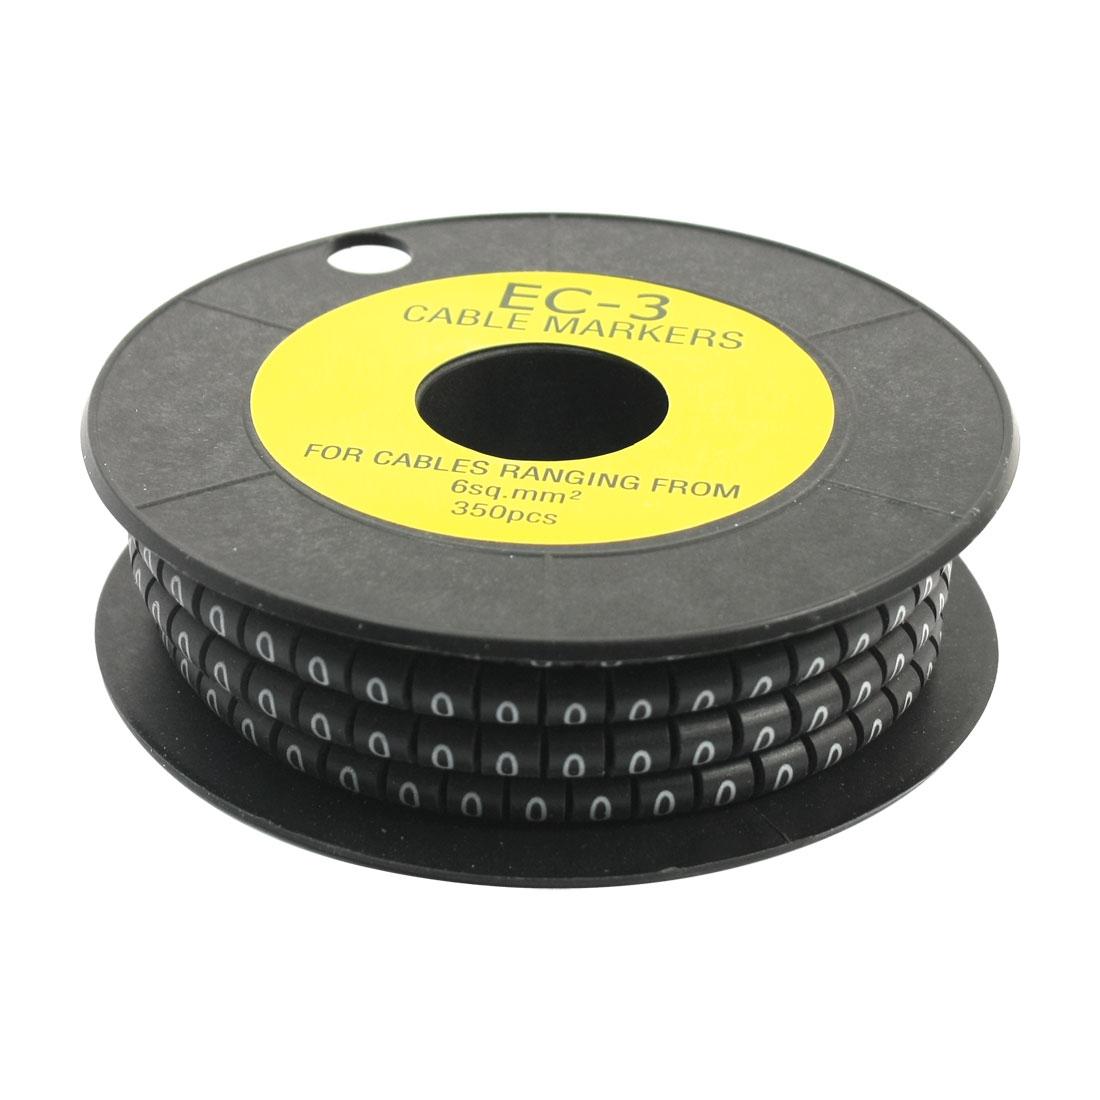 350pcs Number 0 Print 4.5mm Inner Dia EC-3 Soft PVC Flexible Cable Markers Black